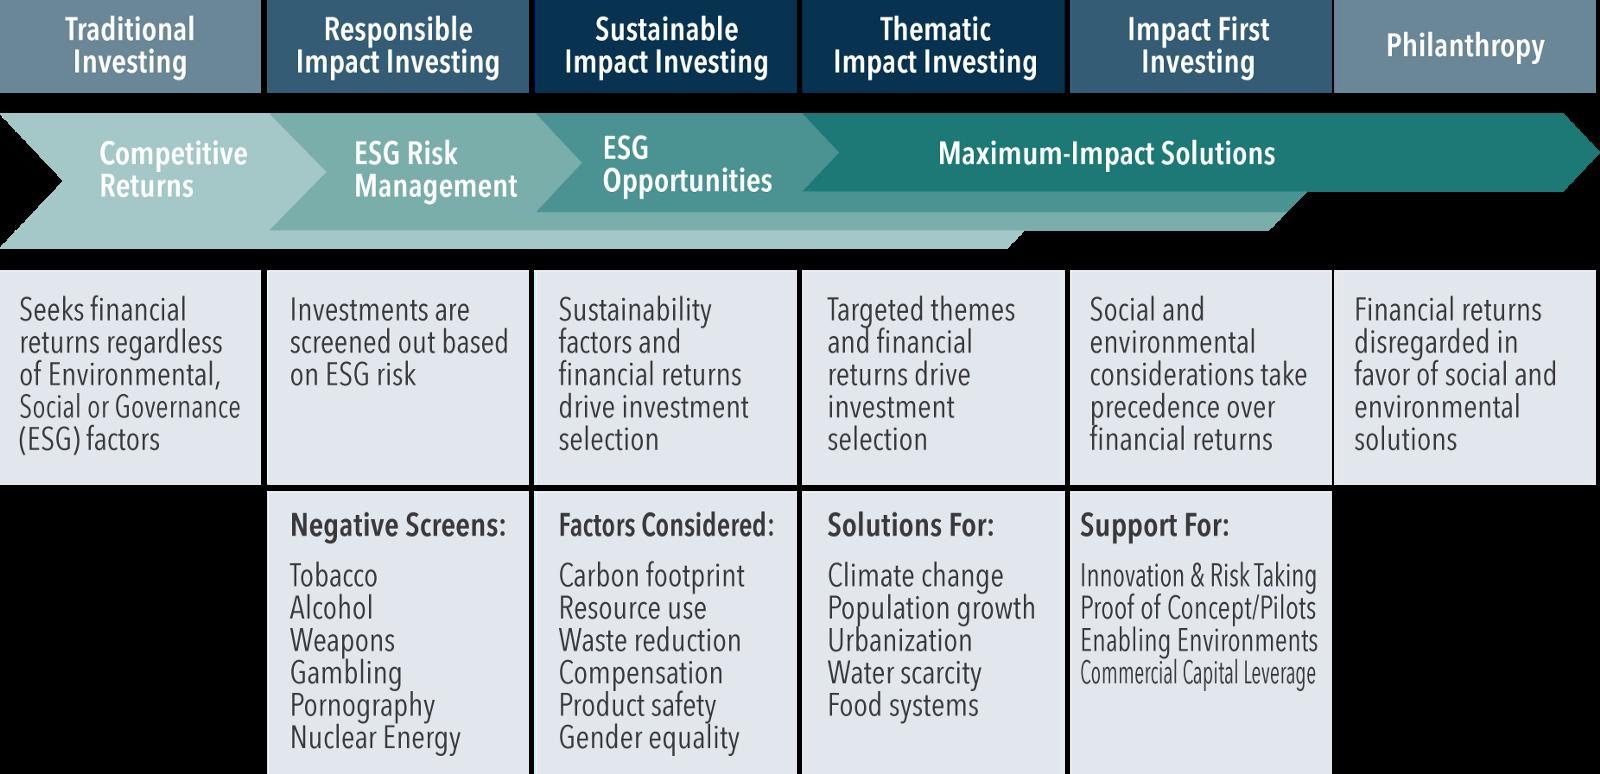 Impact Investing Spectrum by Sonen Capital